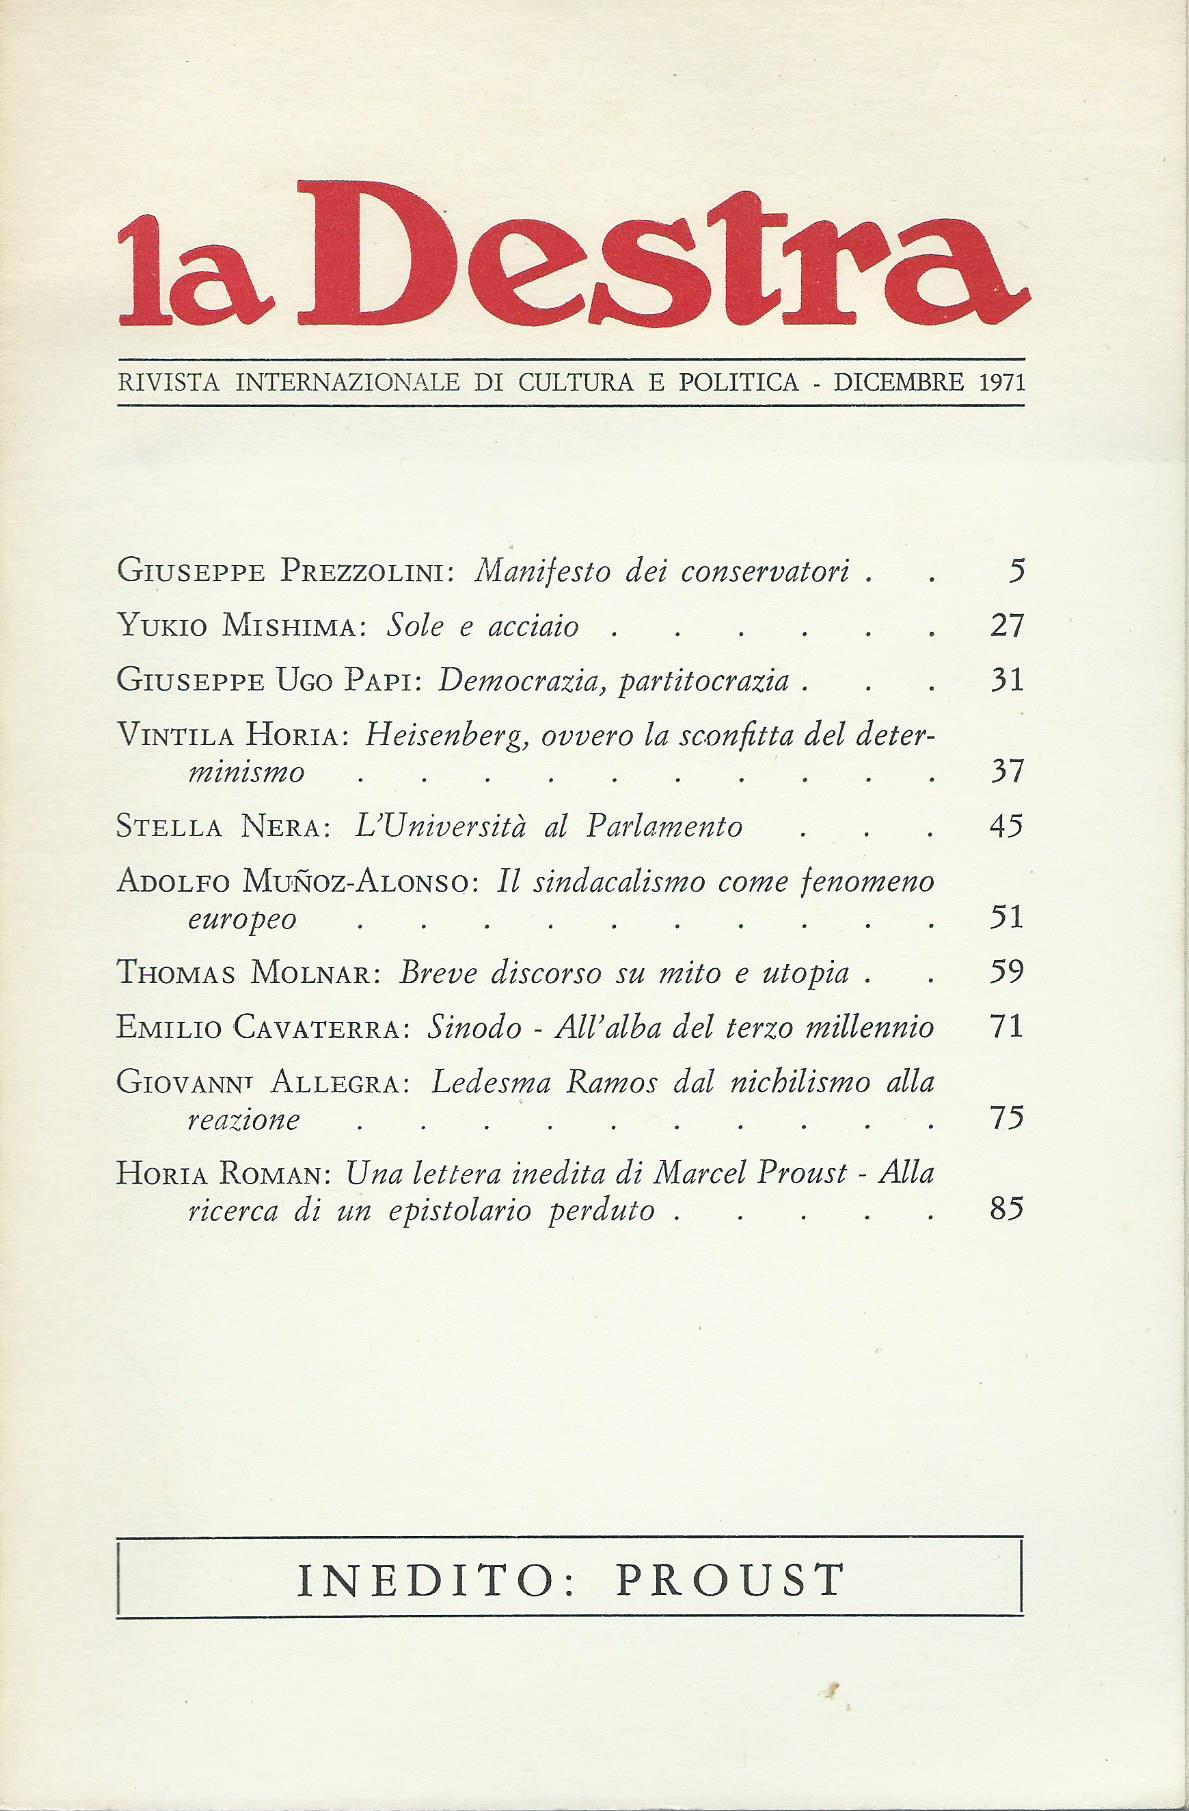 La Destra - Anno I n. 1